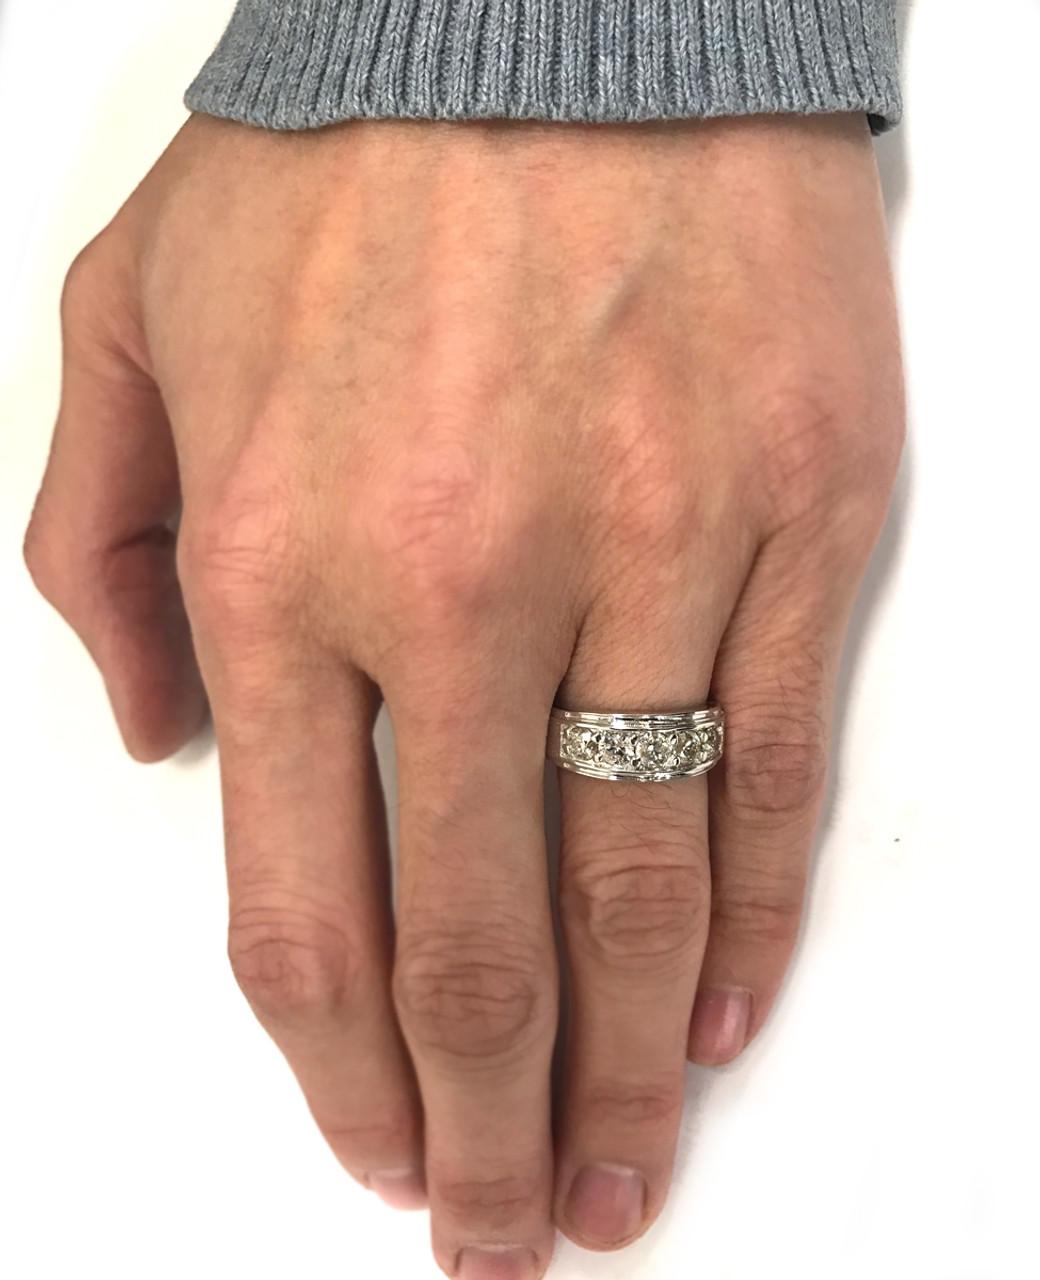 2 Reviews Partnerconnectpompeii3appfilesitemimages58ca96bb762d0: 2 Karat Wedding Rings For Him At Websimilar.org